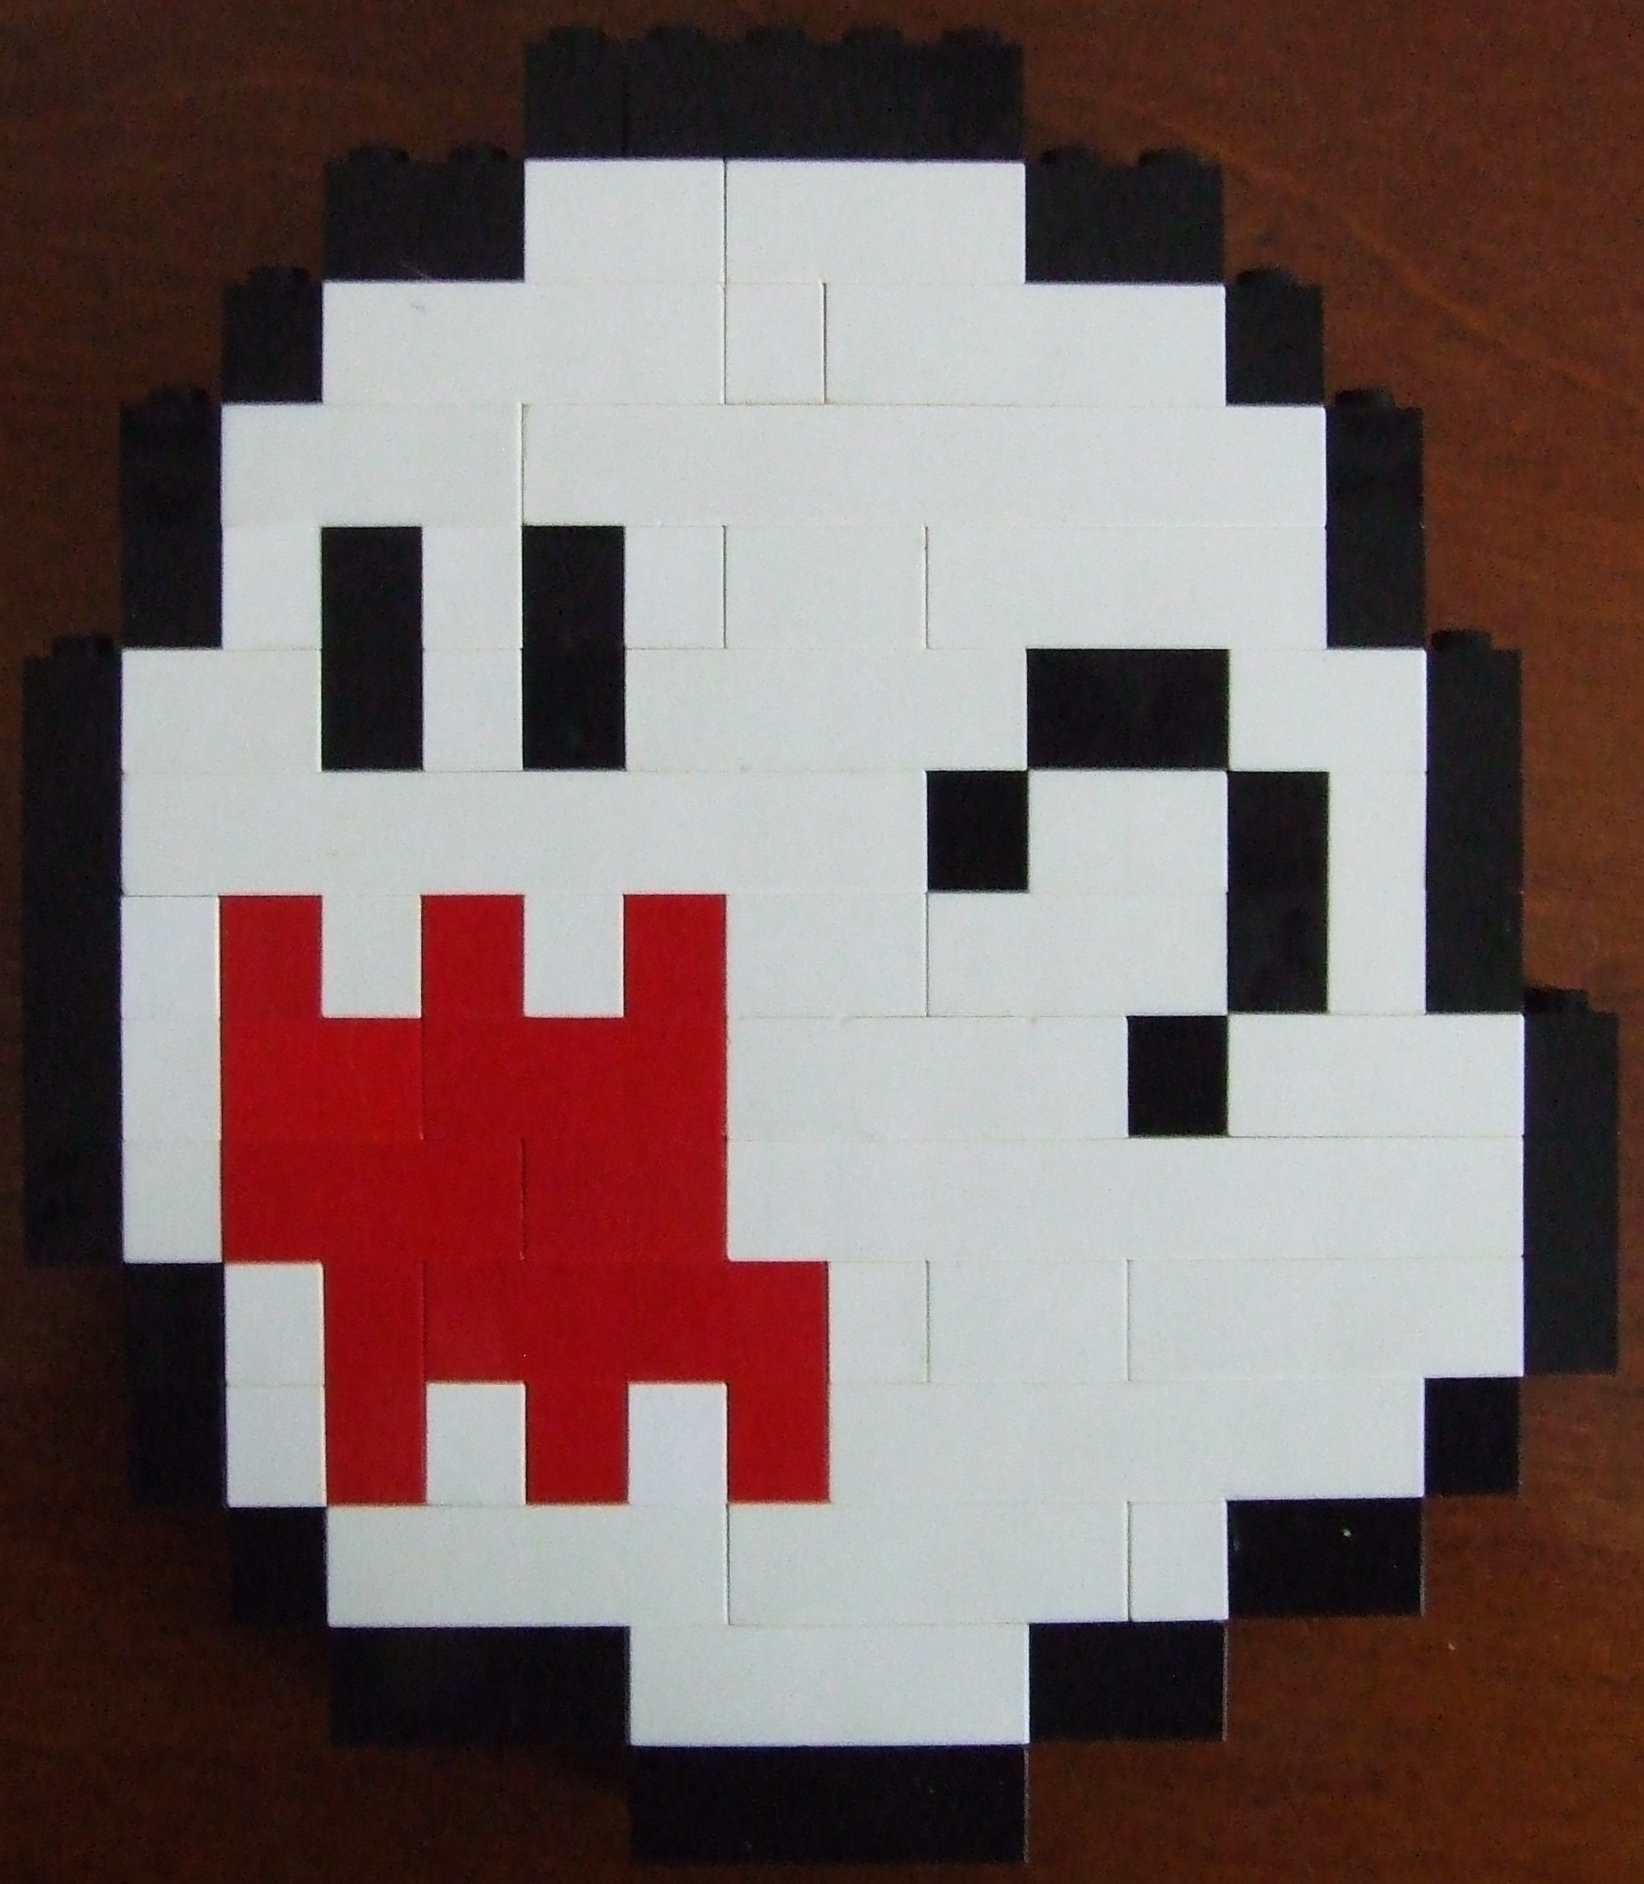 Boo Super Mario World Lego Pixel Art By